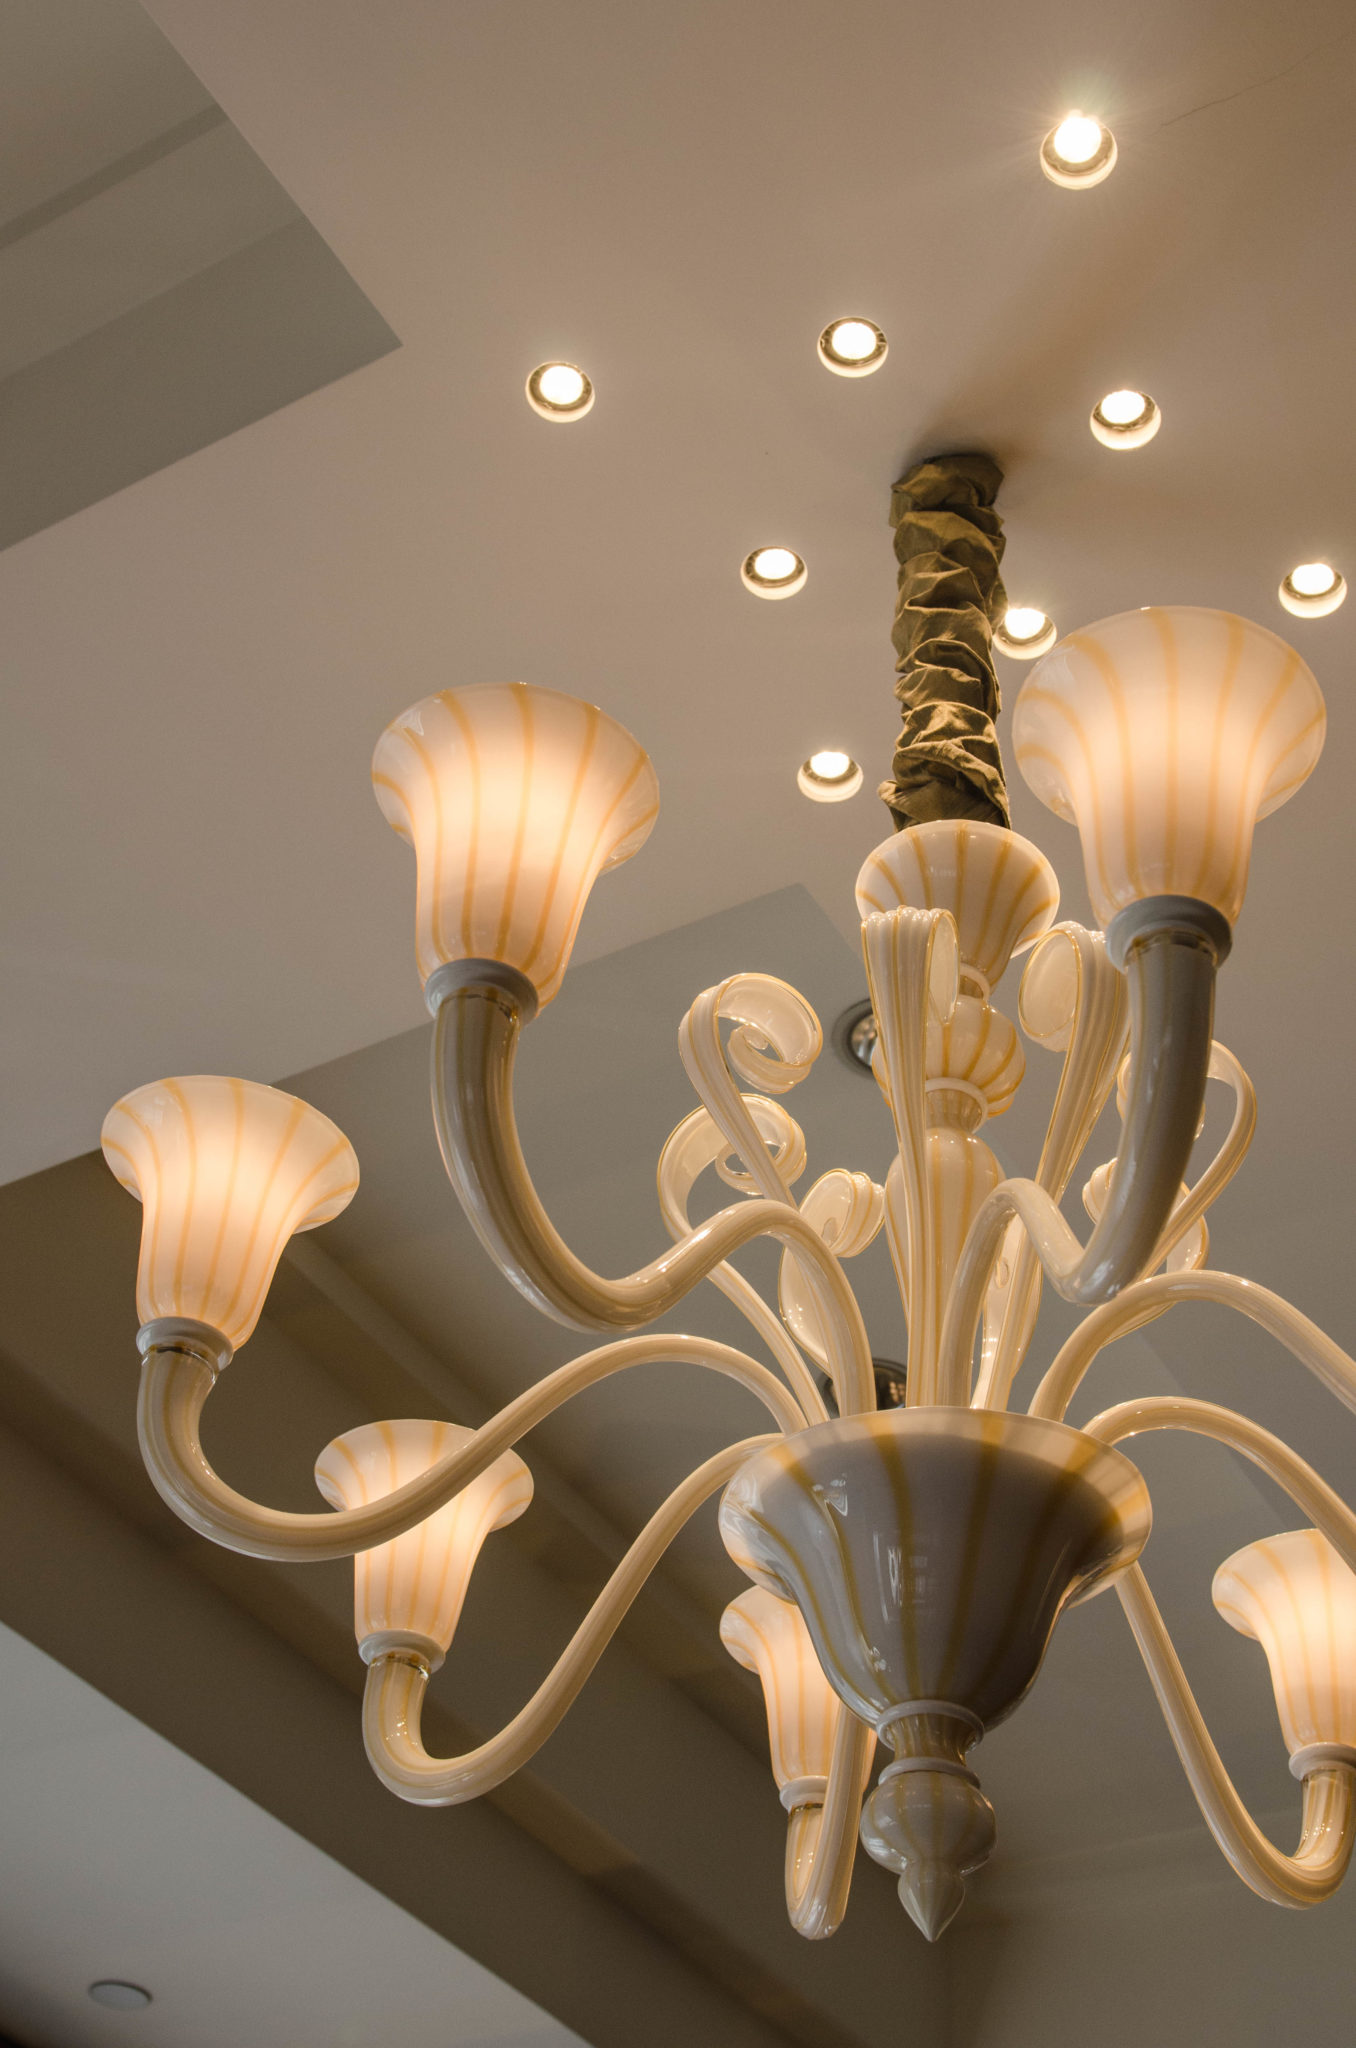 Lanson Place Hotel Hongkong: Merano Glas als Leuchter